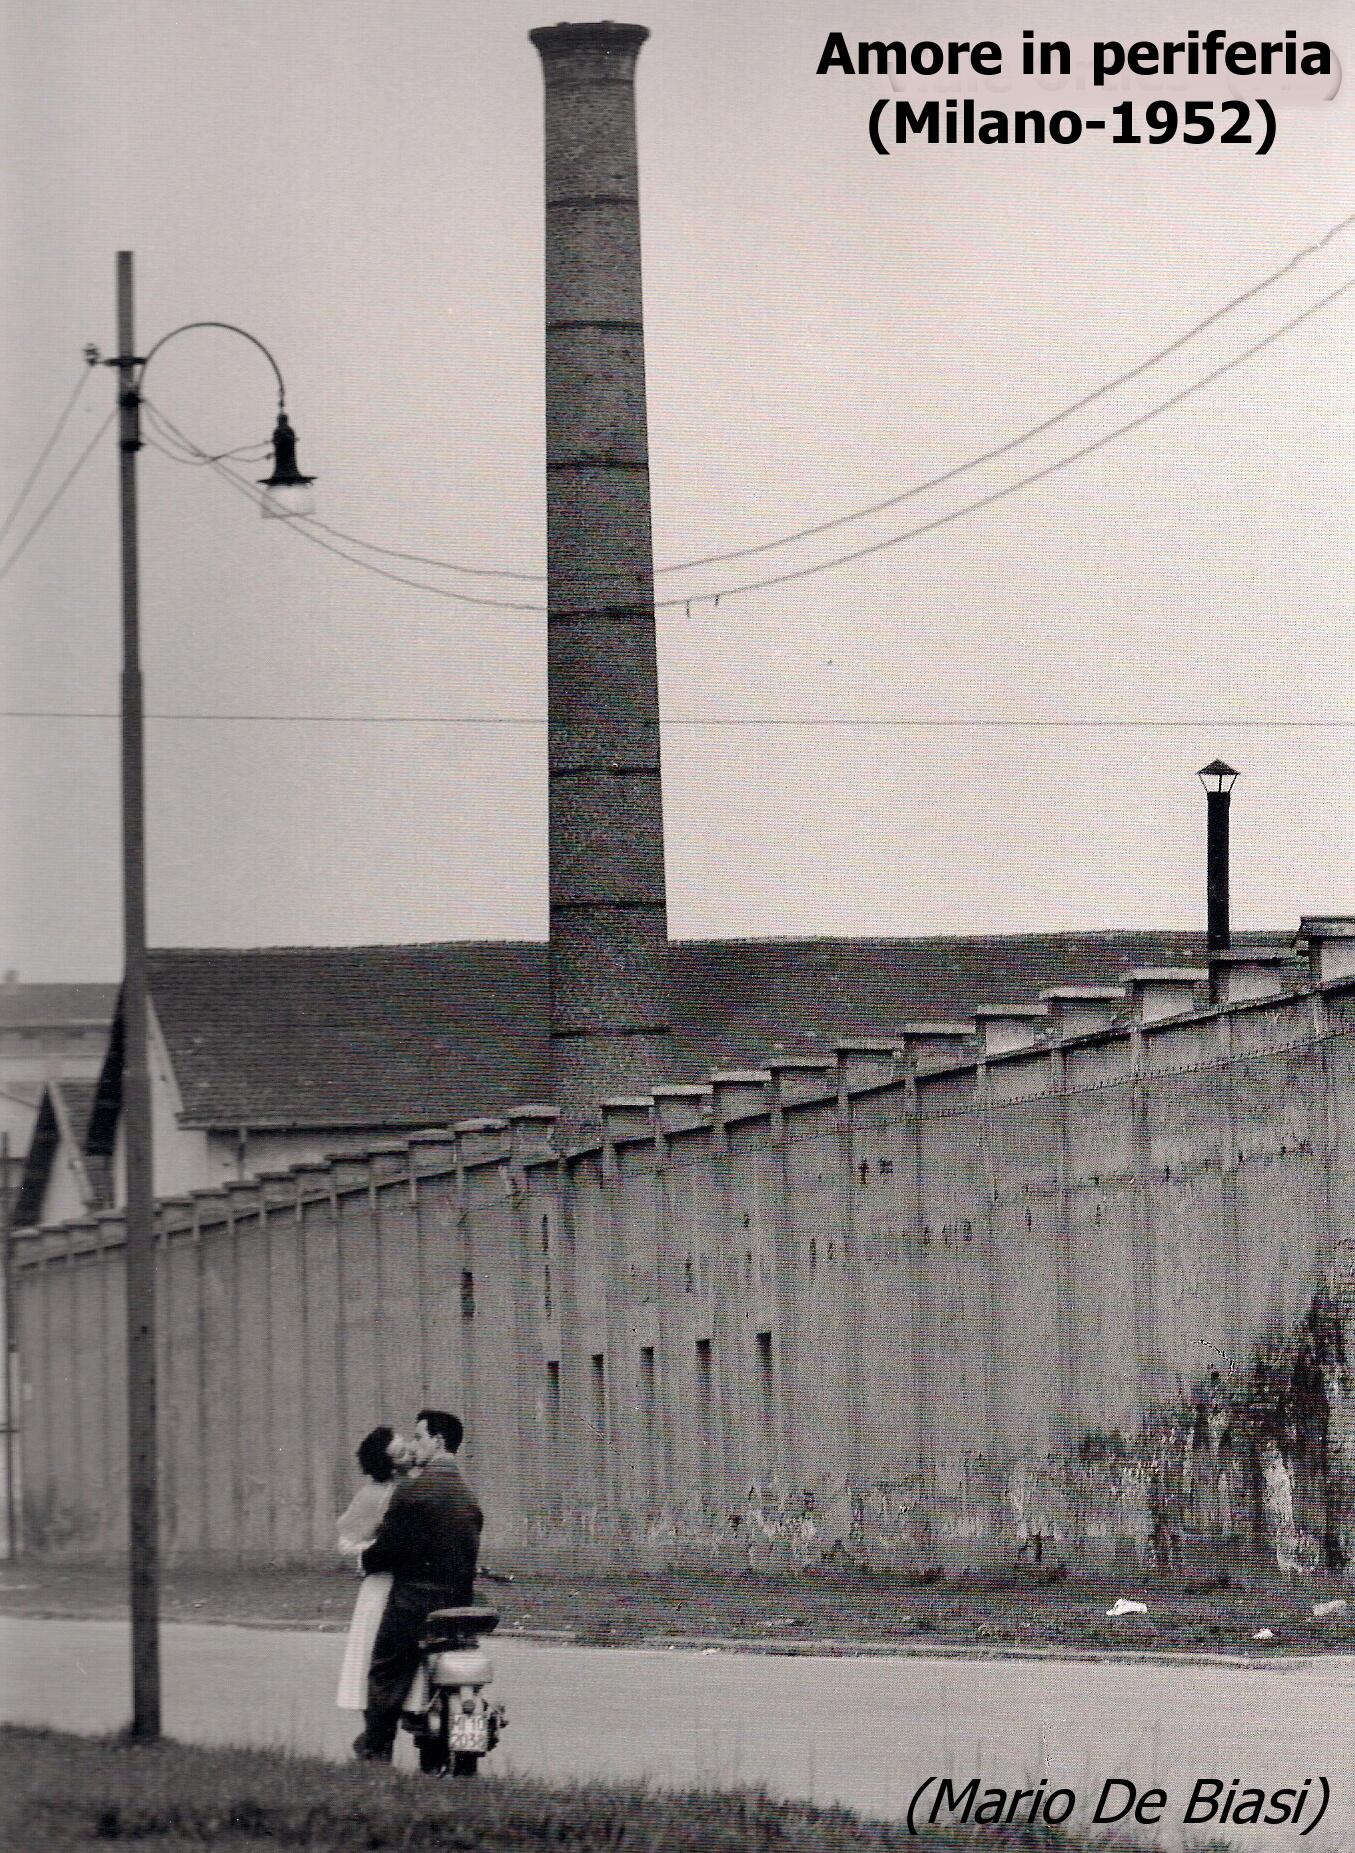 48 - Amore in  periferia  1952